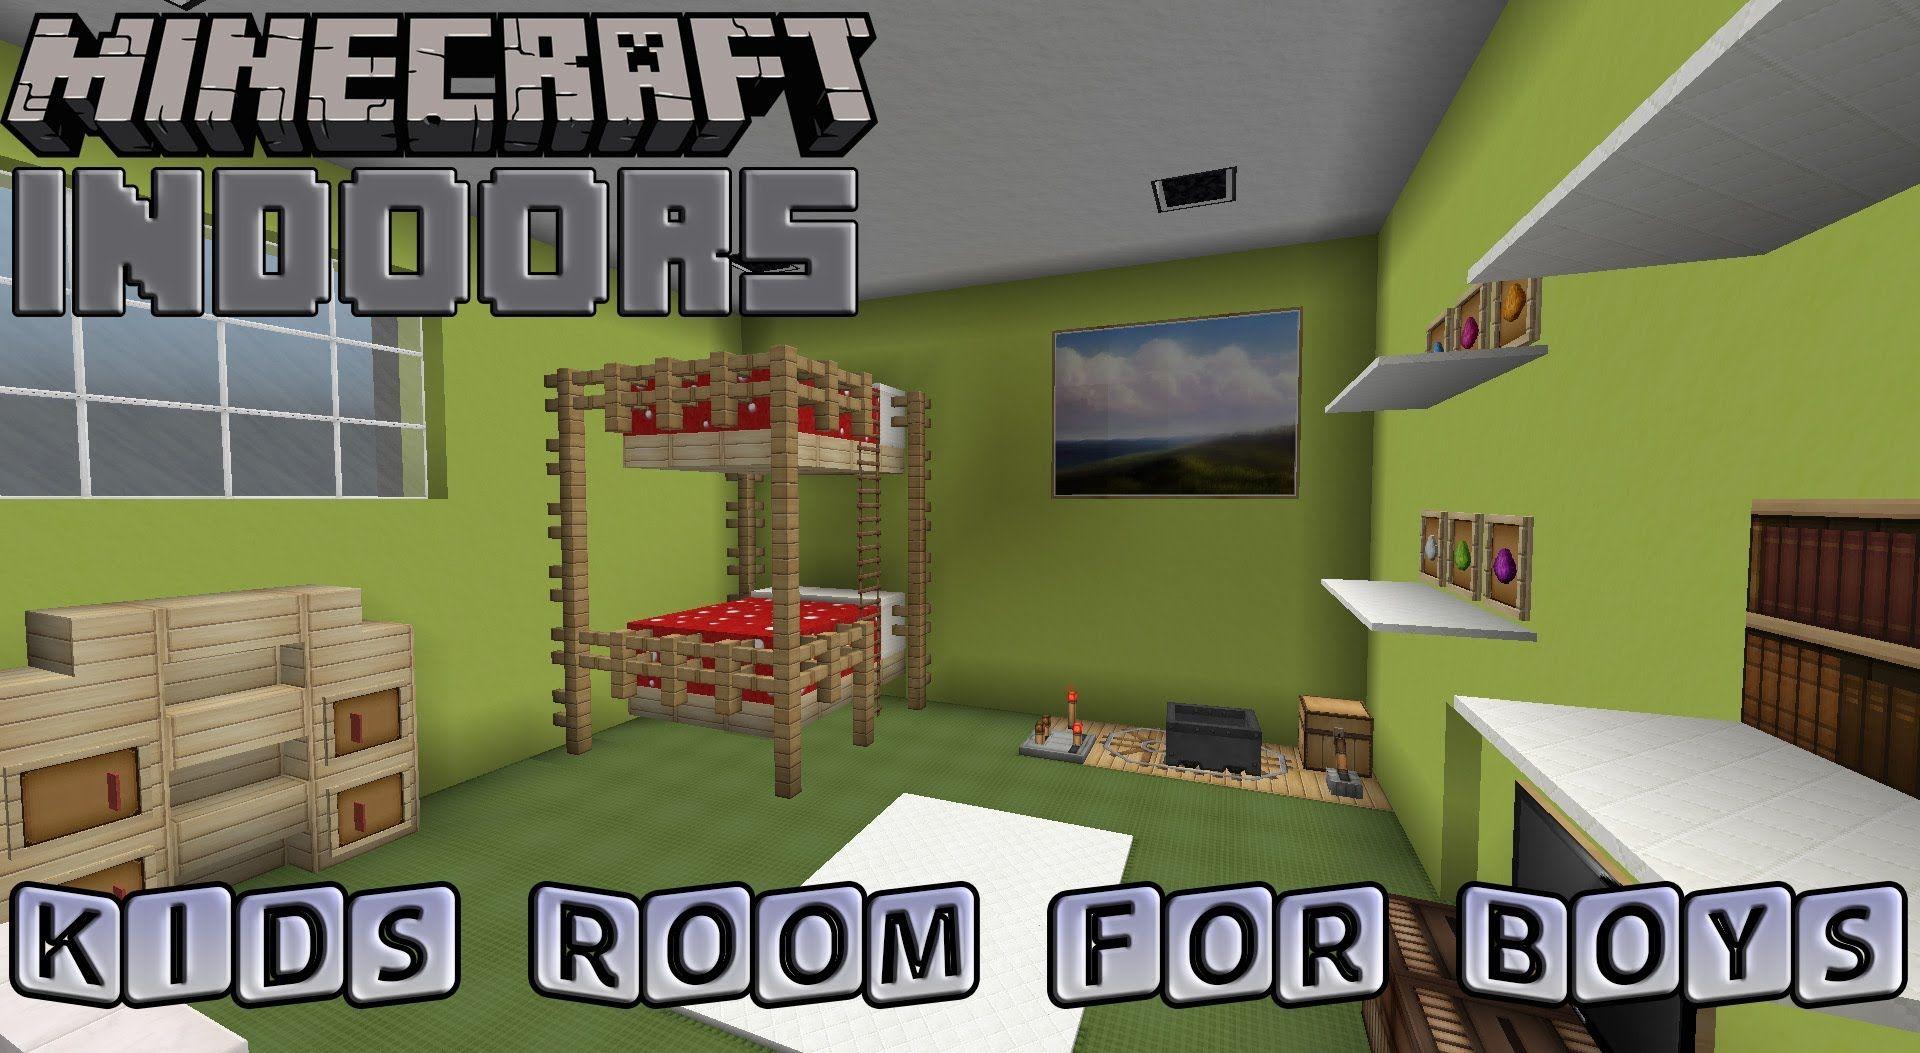 Kids Bedroom For Boys Minecraft Indoors Minecraft Room Minecraft Bedroom Decor Cool Room Designs Small bedroom ideas minecraft